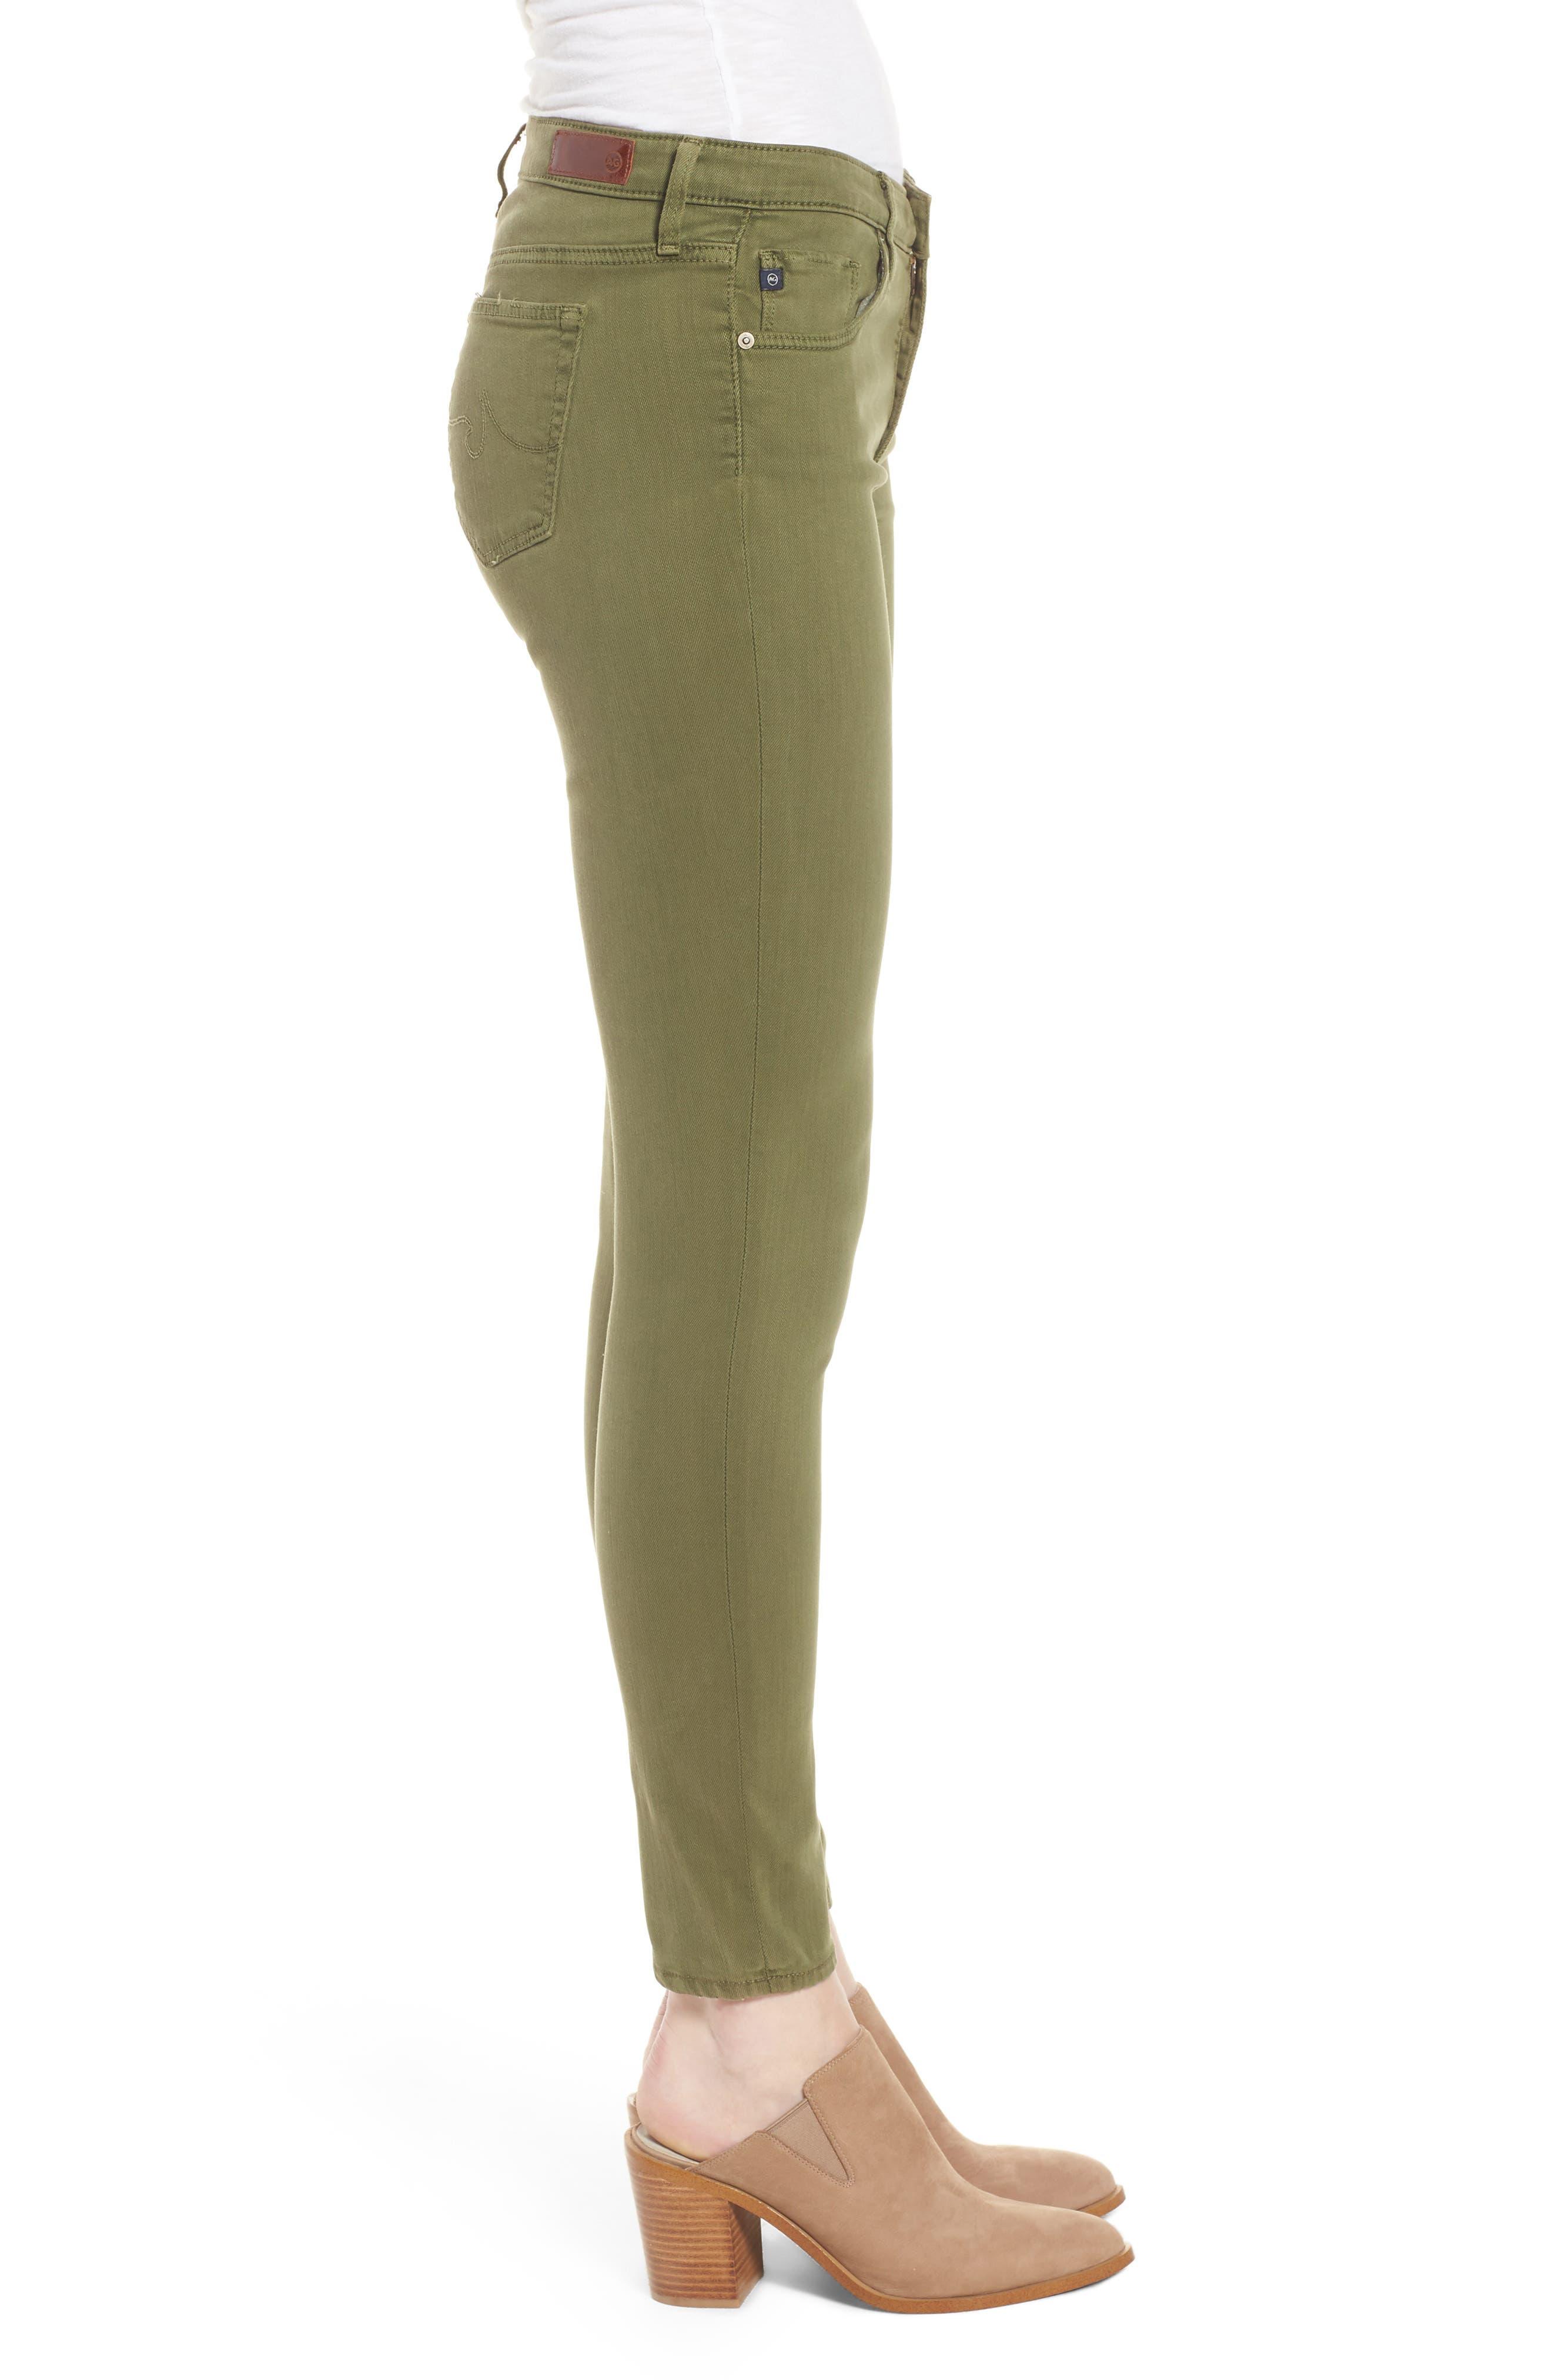 'The Legging' Ankle Jeans,                             Alternate thumbnail 3, color,                             SULFUR OLIVE GROVE